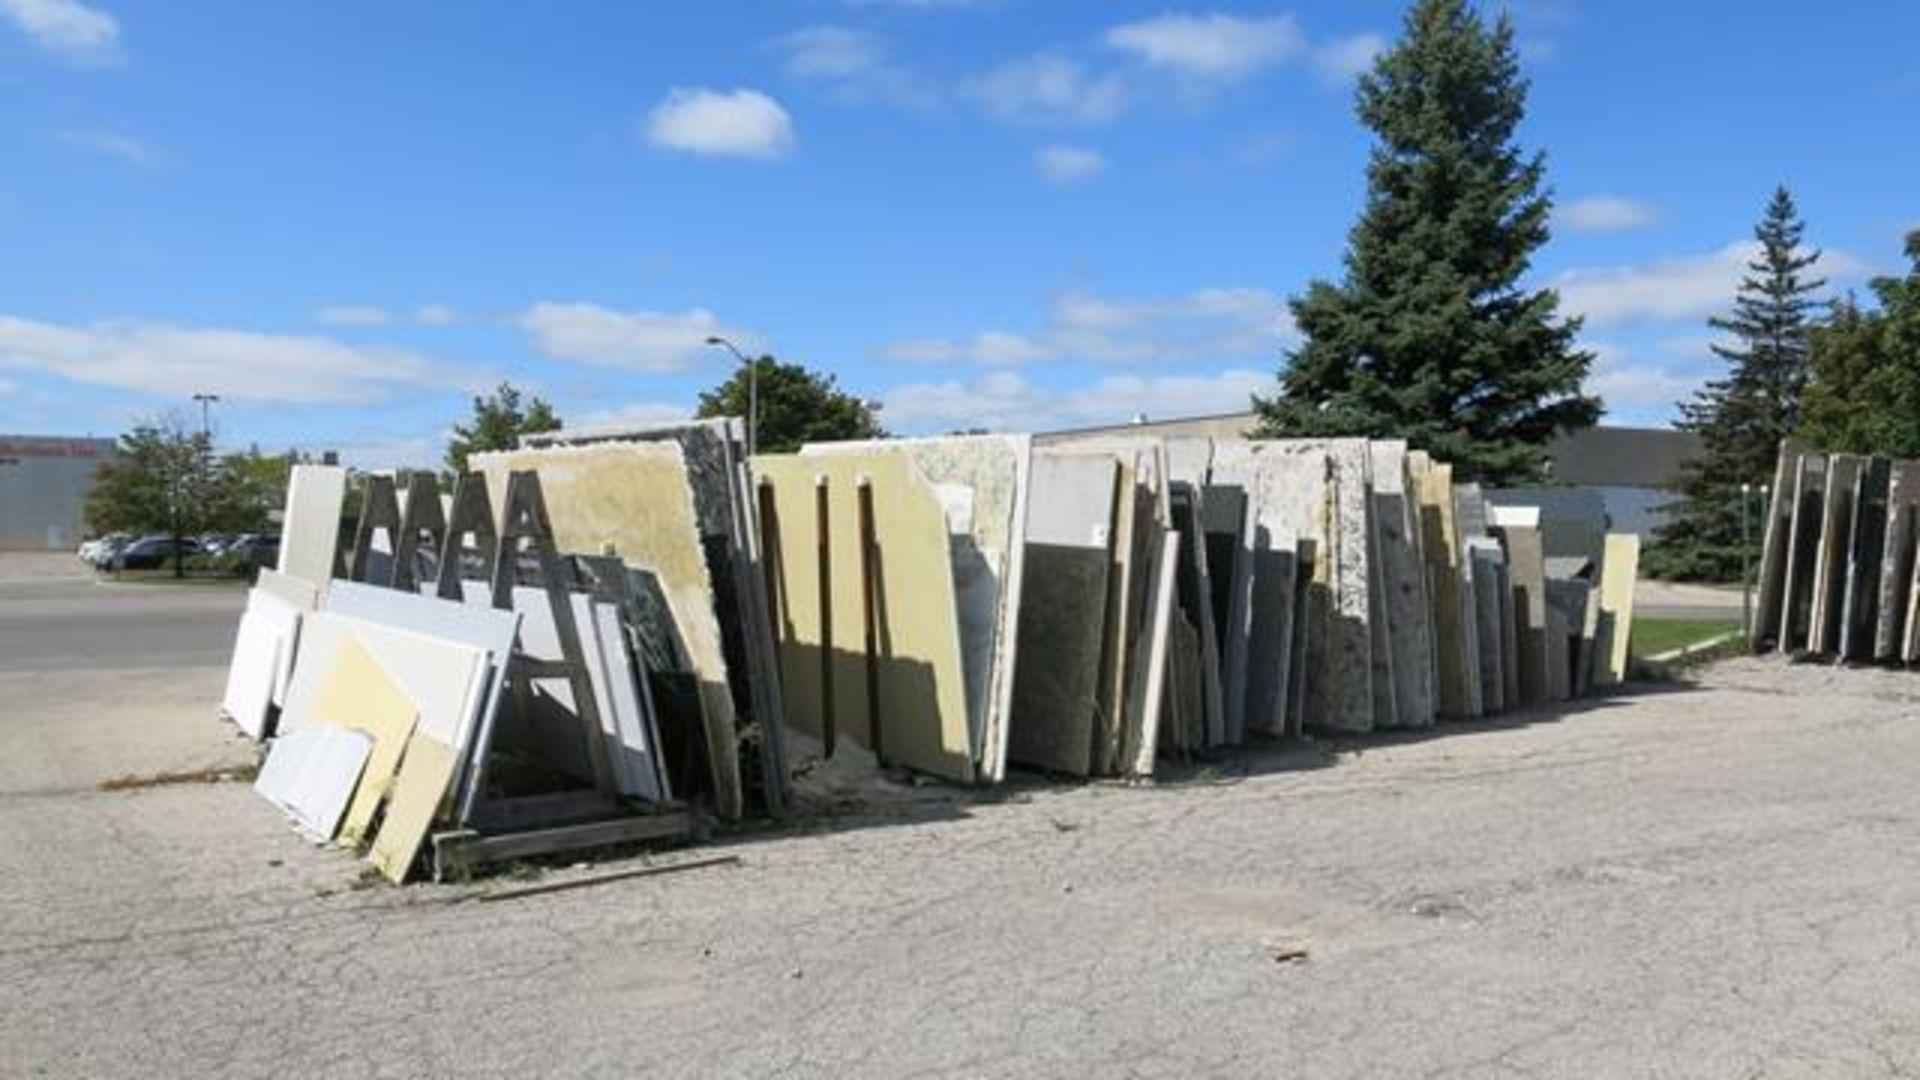 Lot 919 - (500+) SLABS OF QUARTZ, PORCELAIN, MARBLE AND GRANITE